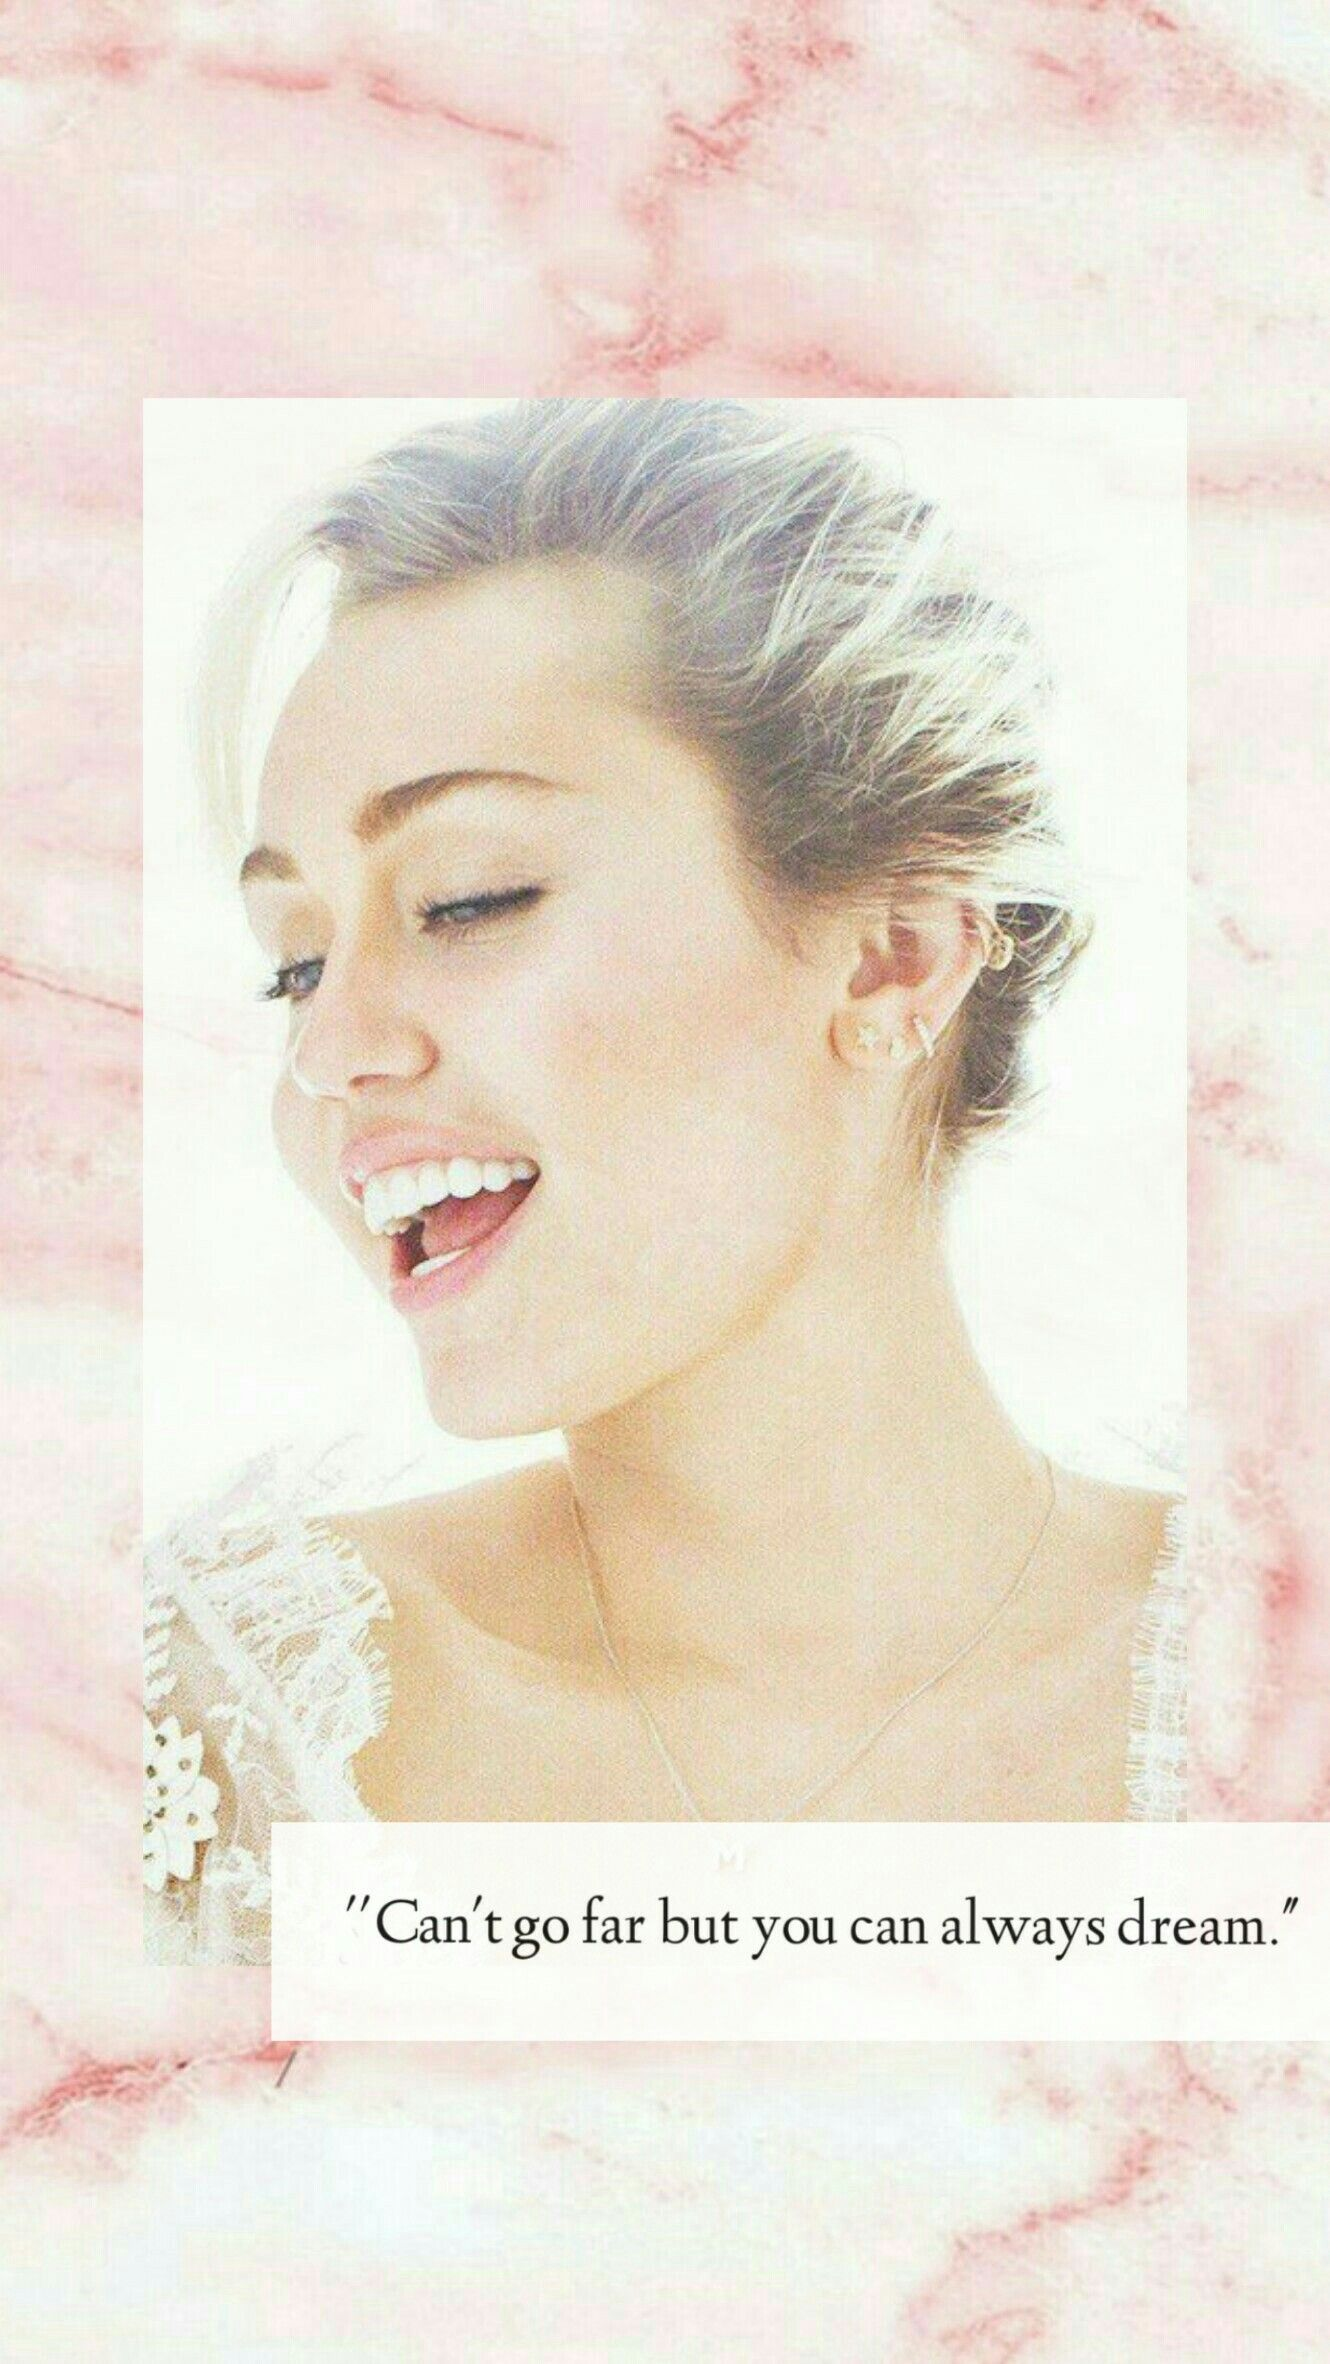 Zoella iphone wallpaper tumblr - Miley Cyrus Wallpaper Tumblr Iphone Hannah Montana Malibu New Album New Song Queen Is Back Smilers